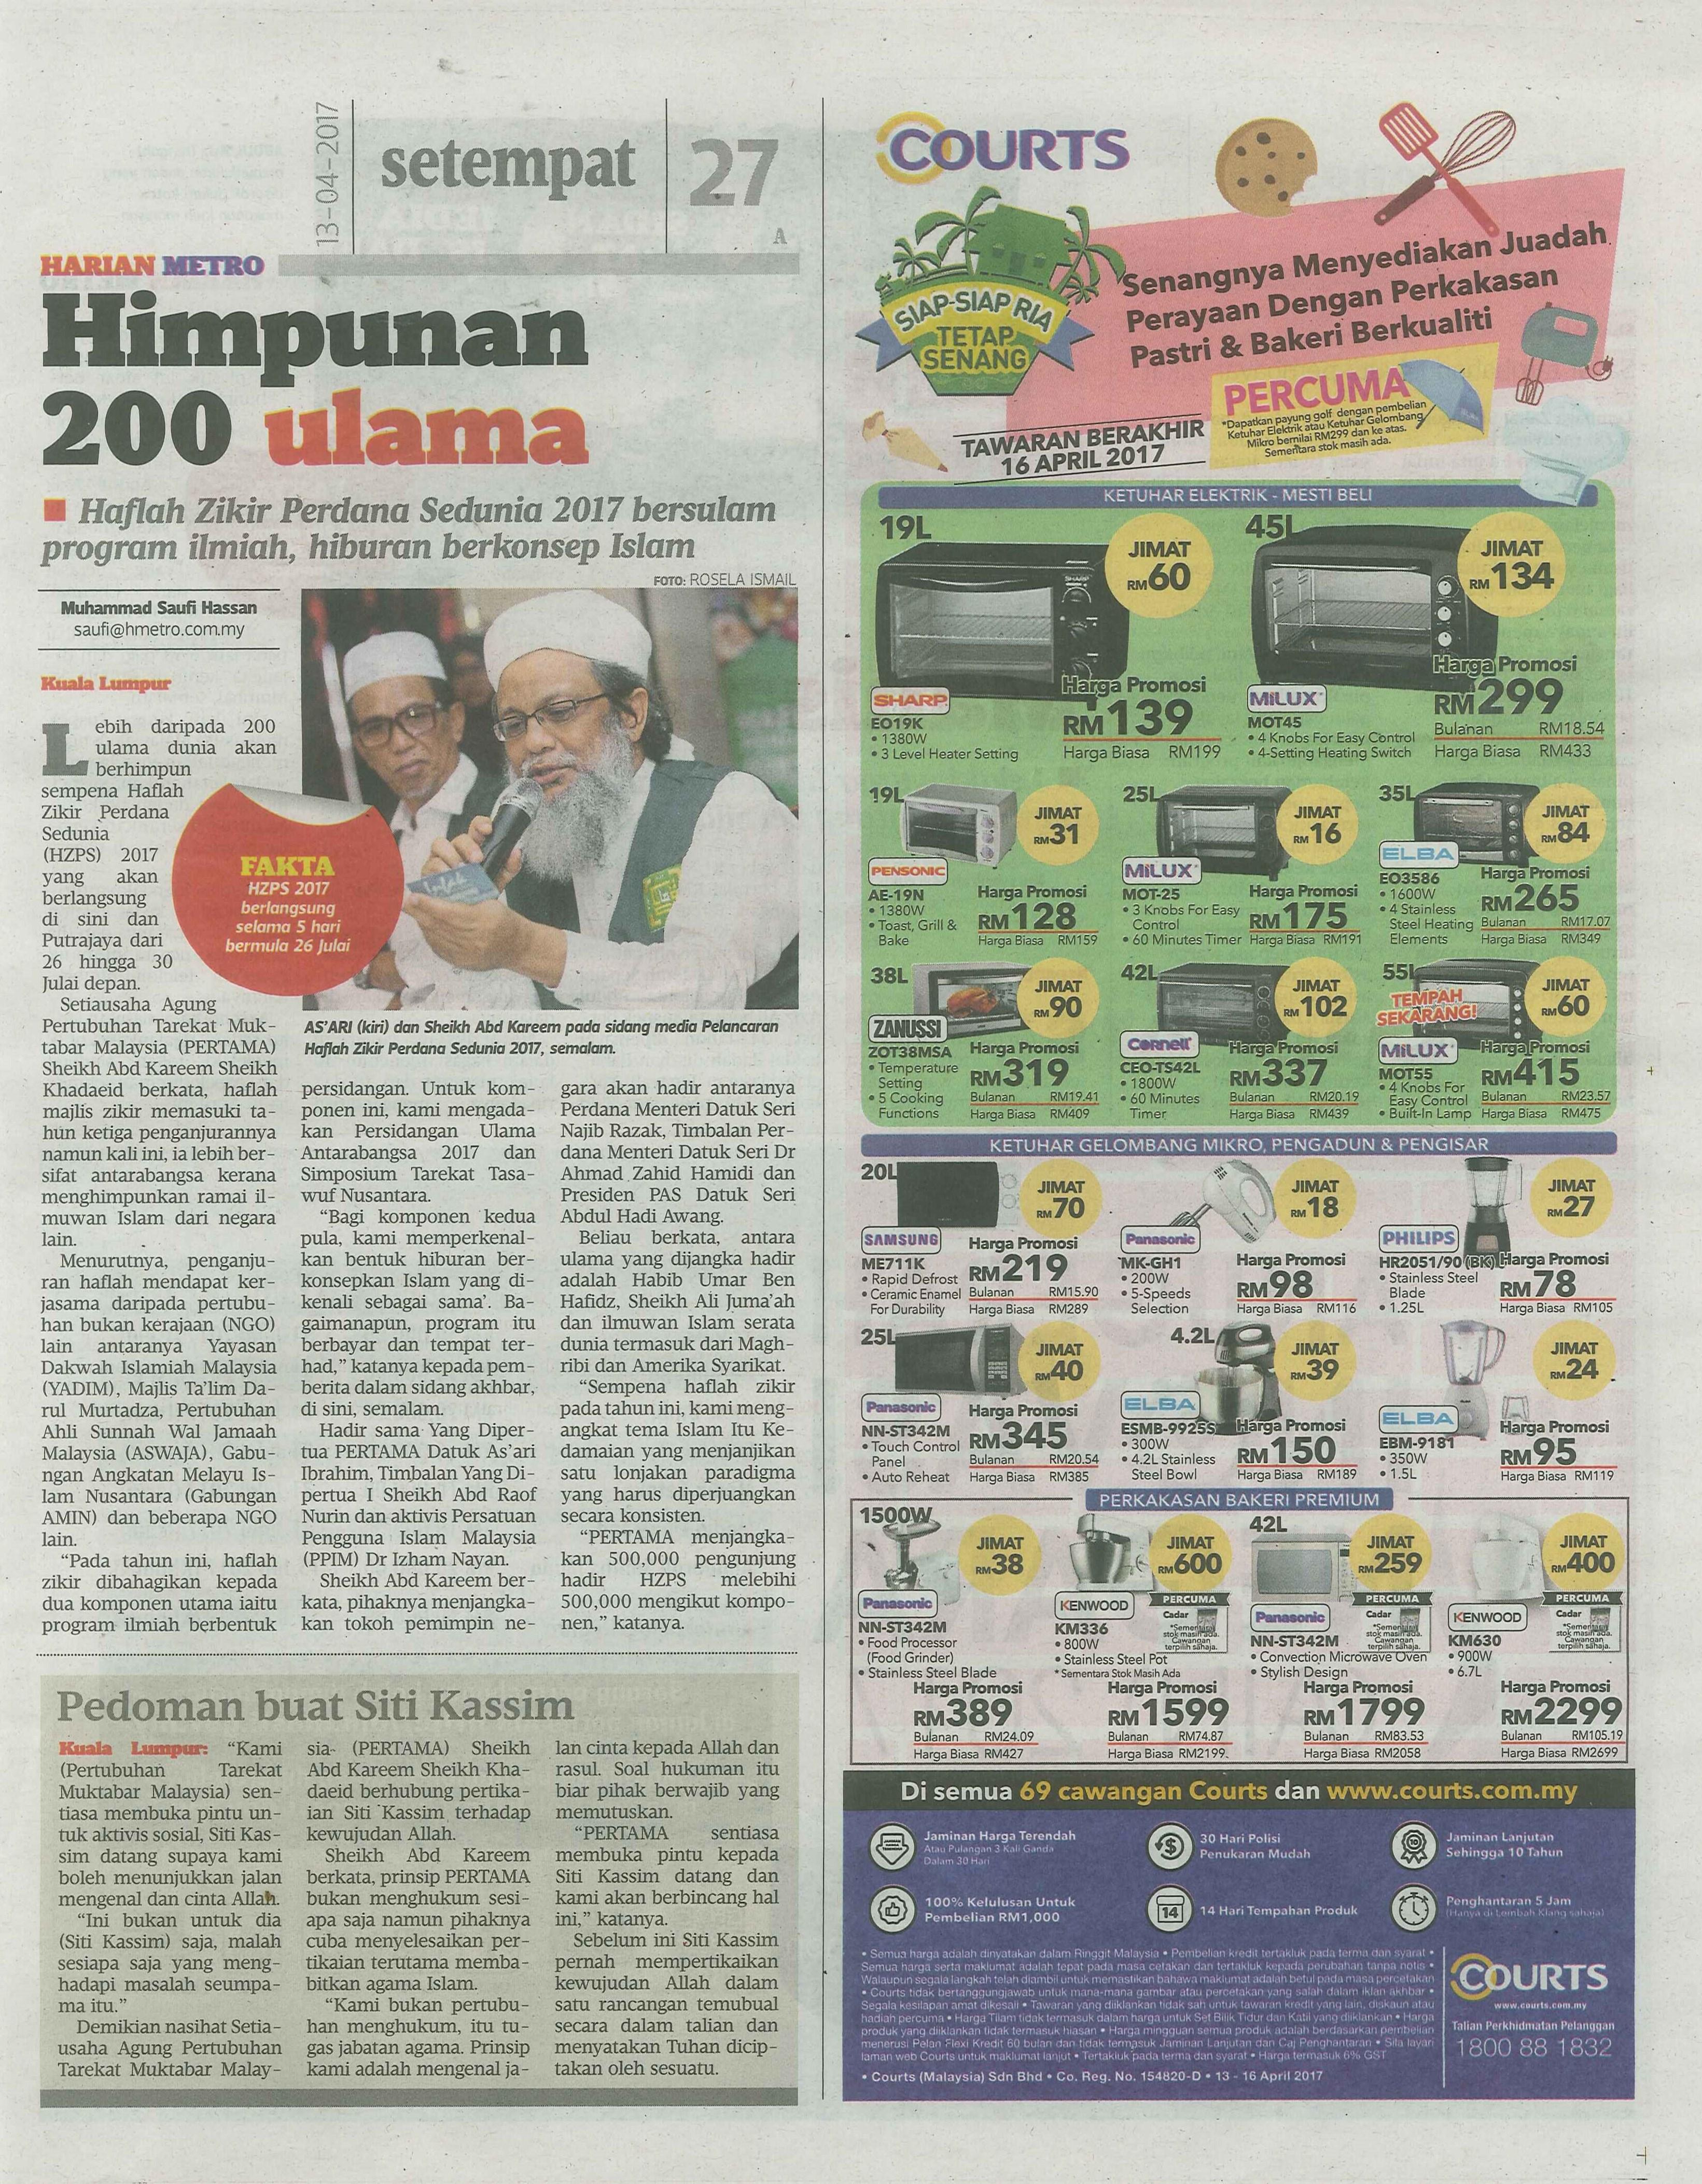 harian metro 13.4.2017